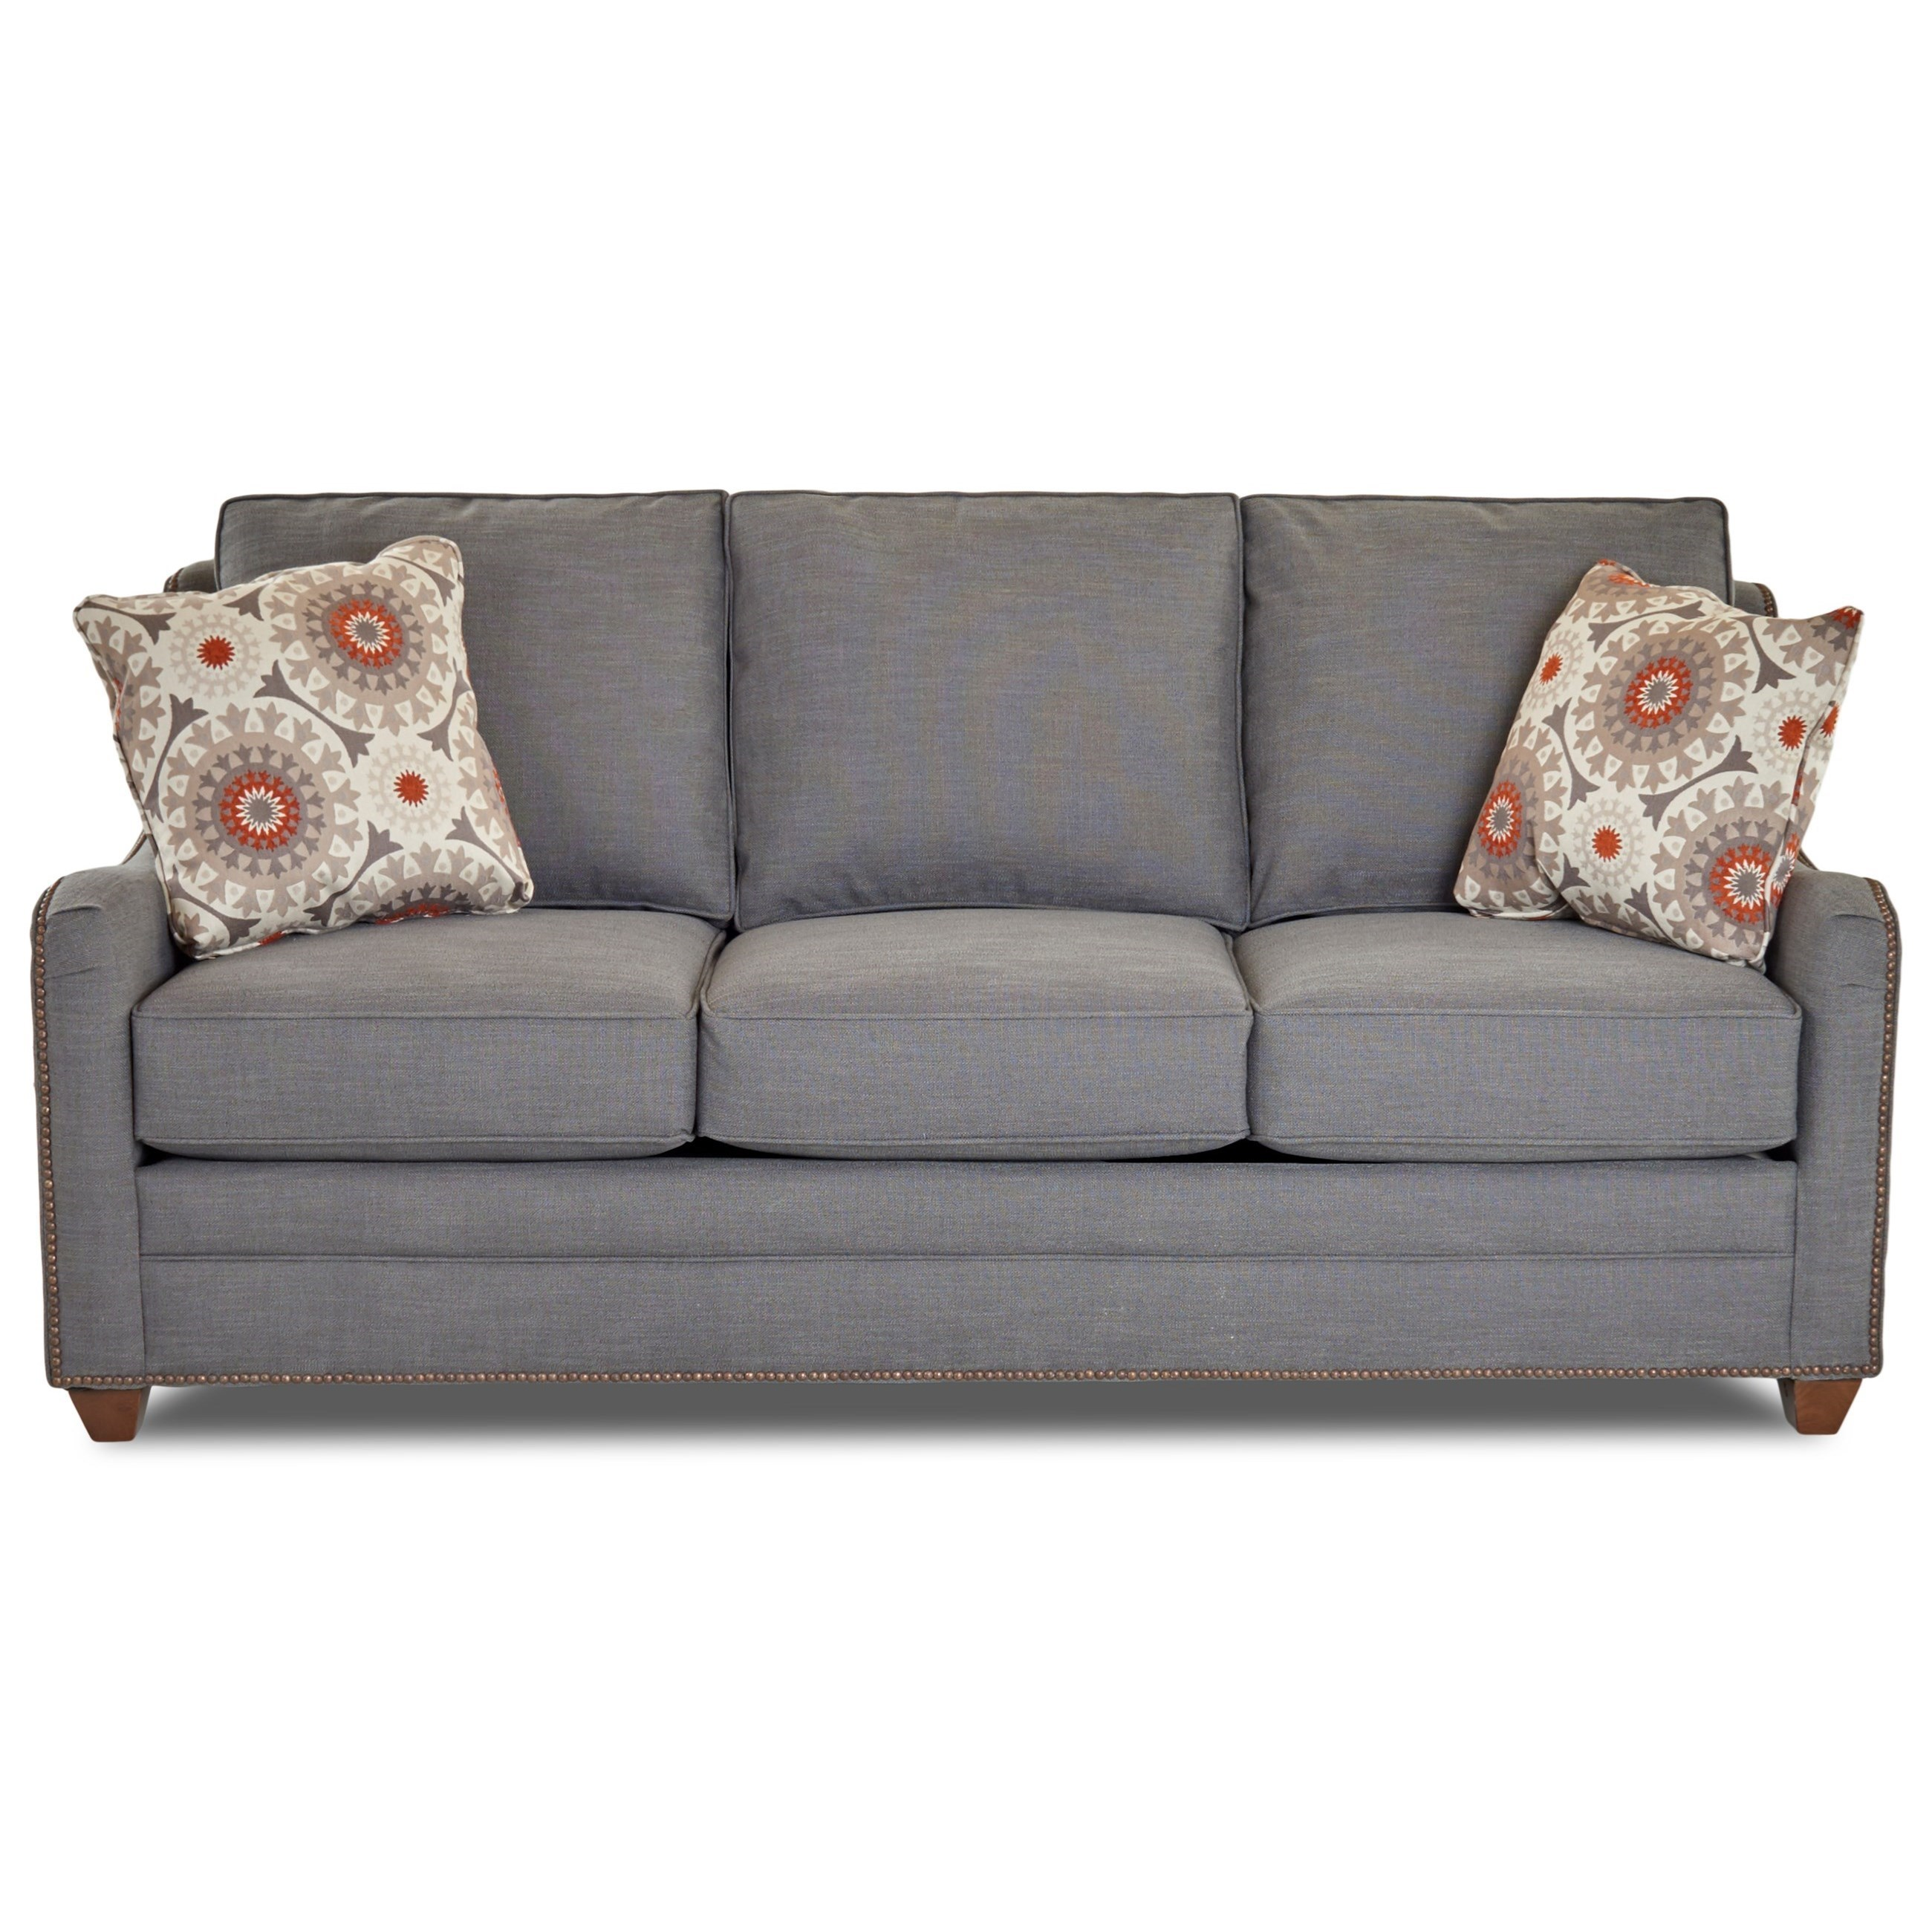 Klaussner KylerSleeper Sofa W/ Enso Memory Foam Mattress ...